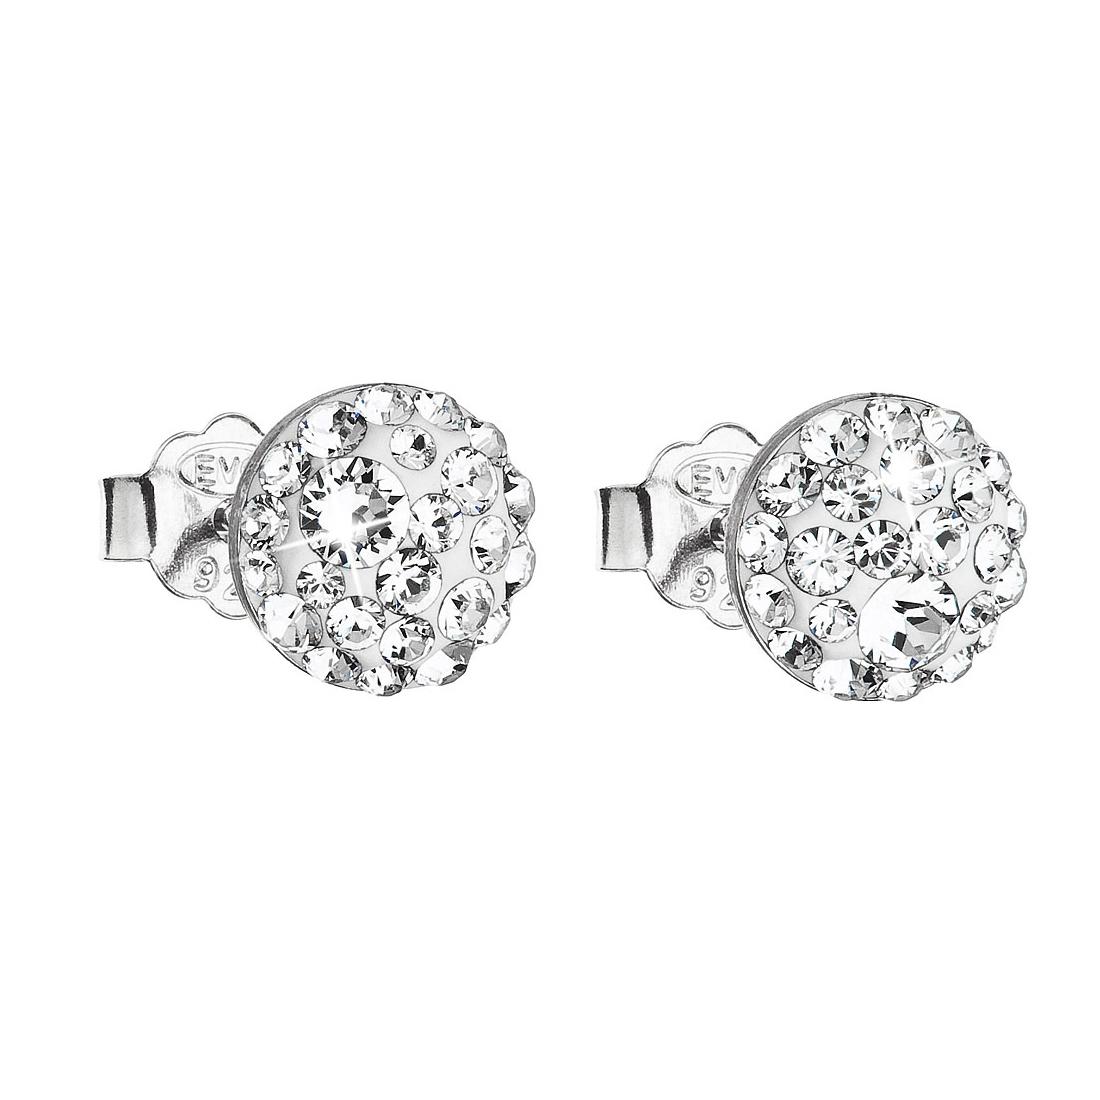 Stříbrné náušnice s krystaly Crystals from Swarovski®, Crystal EG2008-C